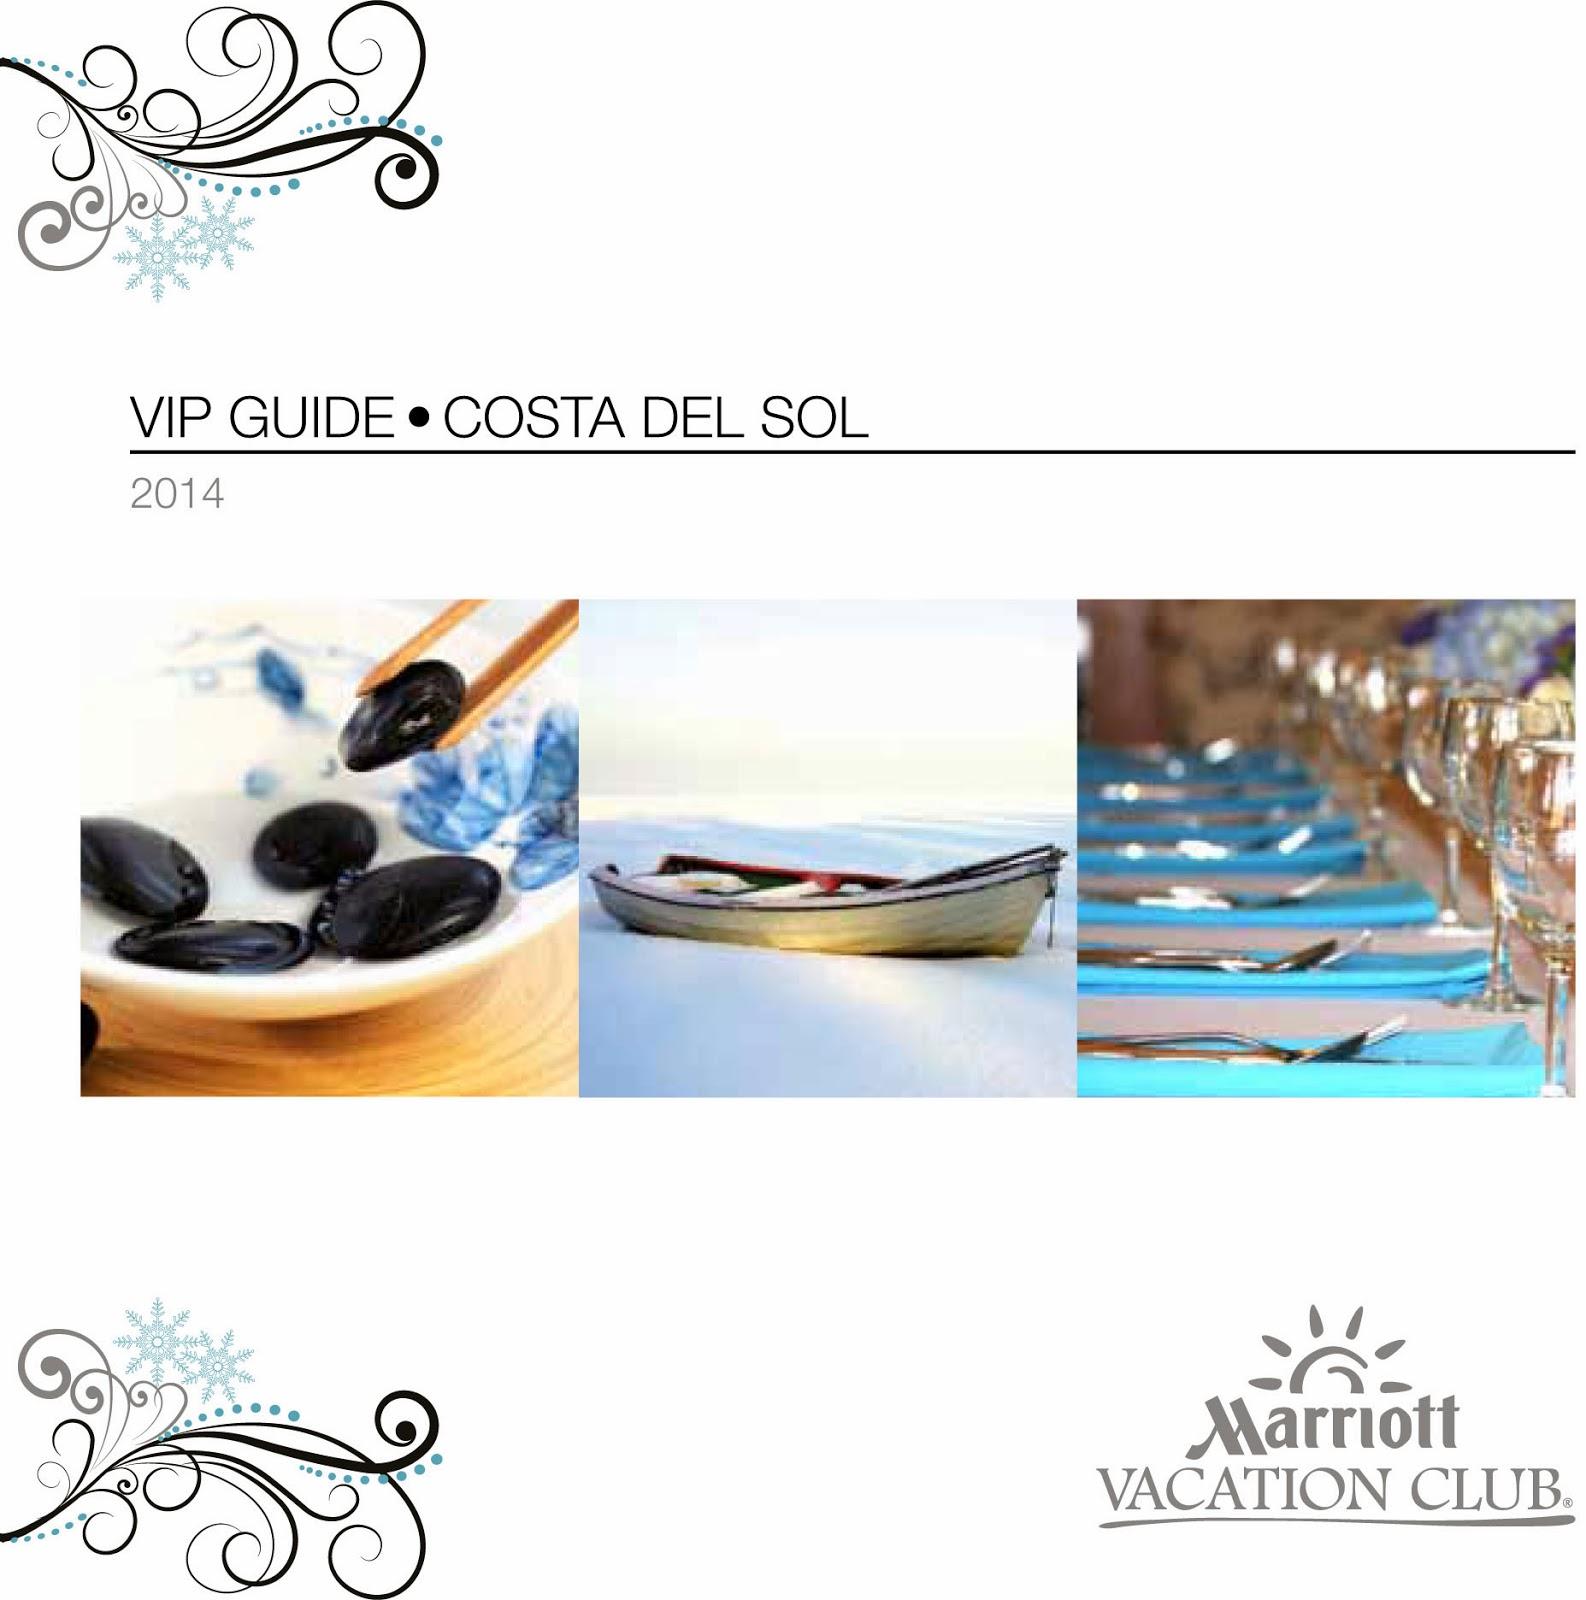 http://issuu.com/sunsearchmedia/docs/marriott_s_vip_guide_9_issuu